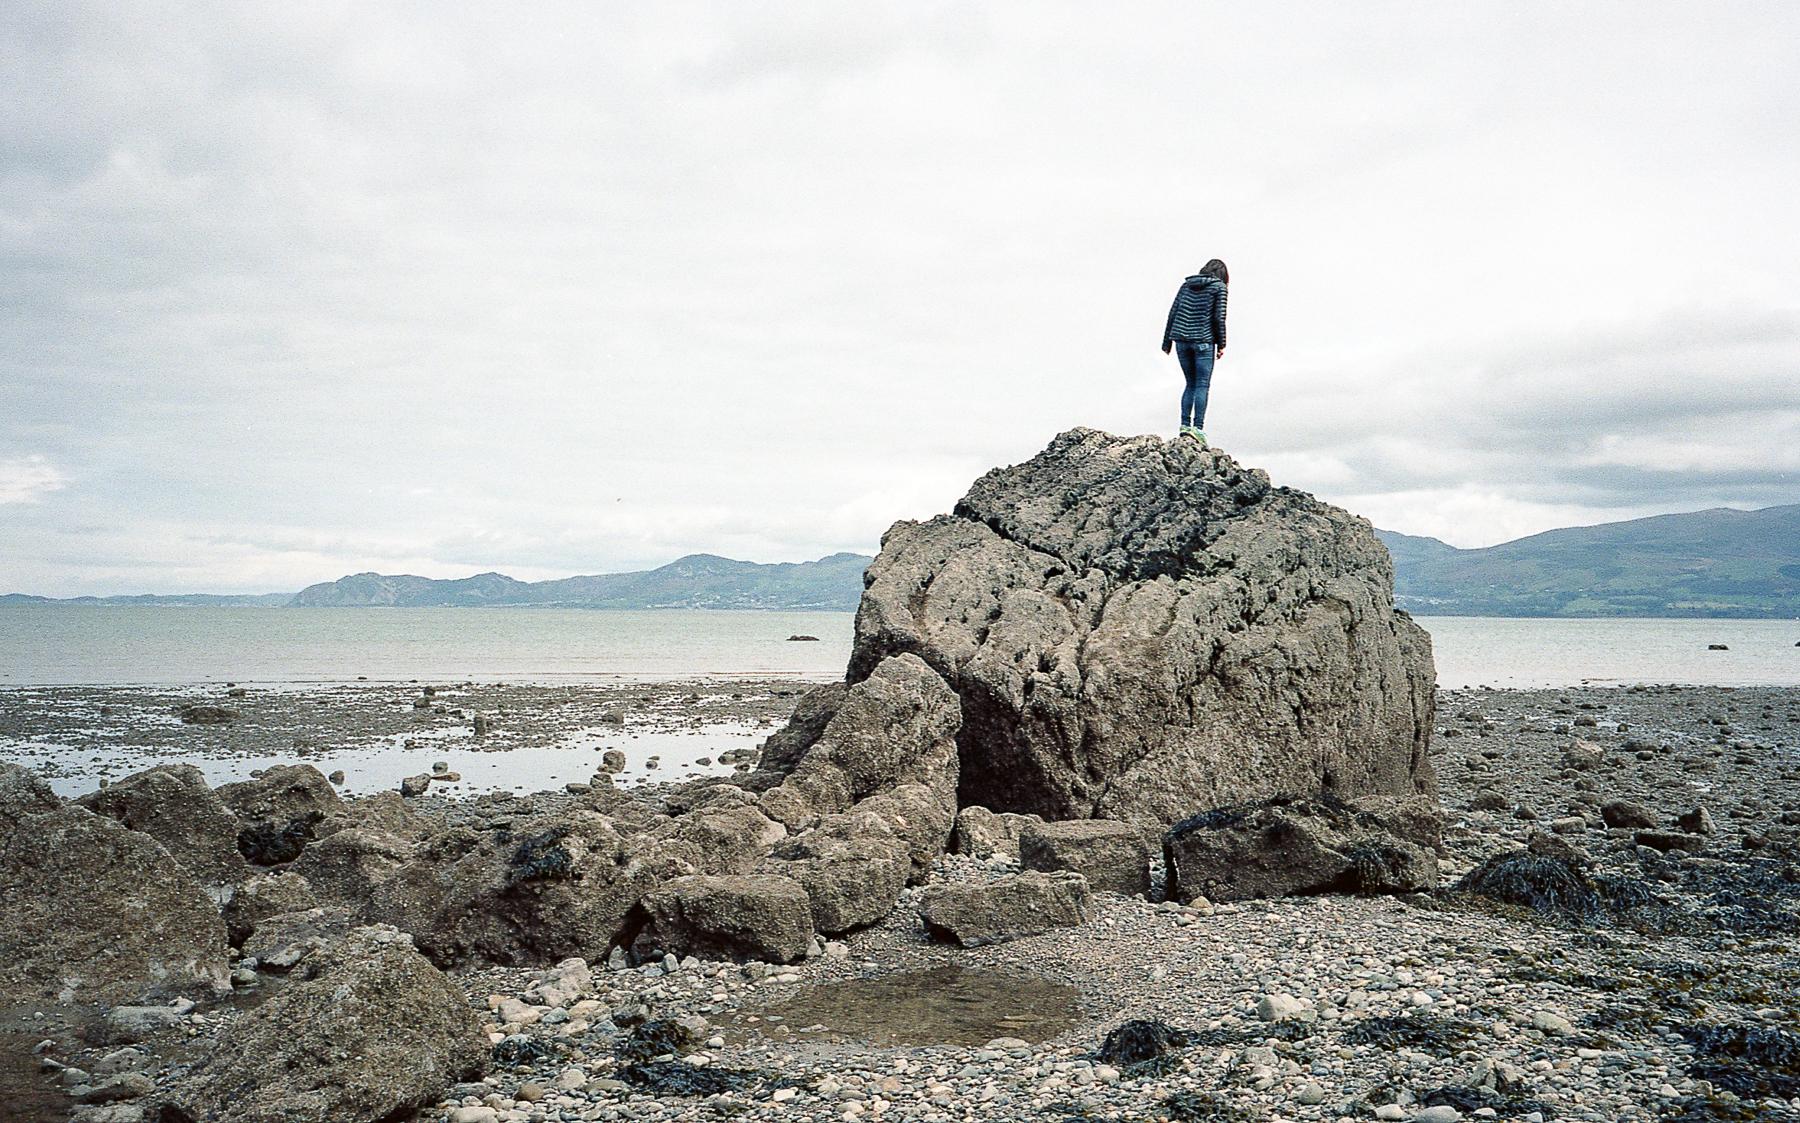 Trepidation | Leica M6 | Zeiss Biogon 35mm f2.8 | Portra160 | Robert Law